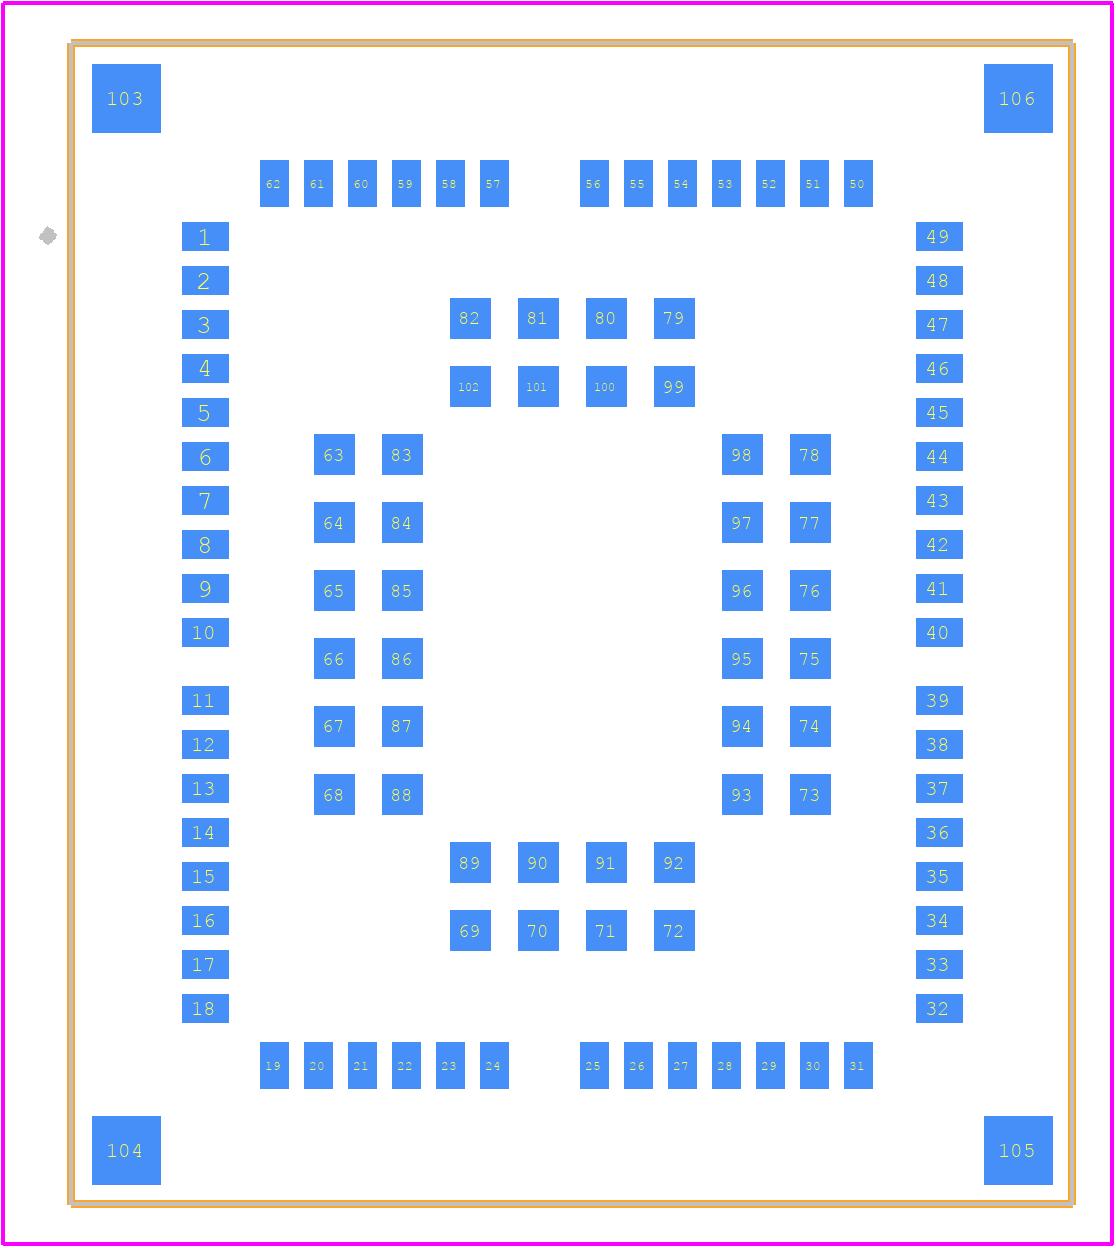 EG95-E - Quectel PCB footprint - Other - EG95-E